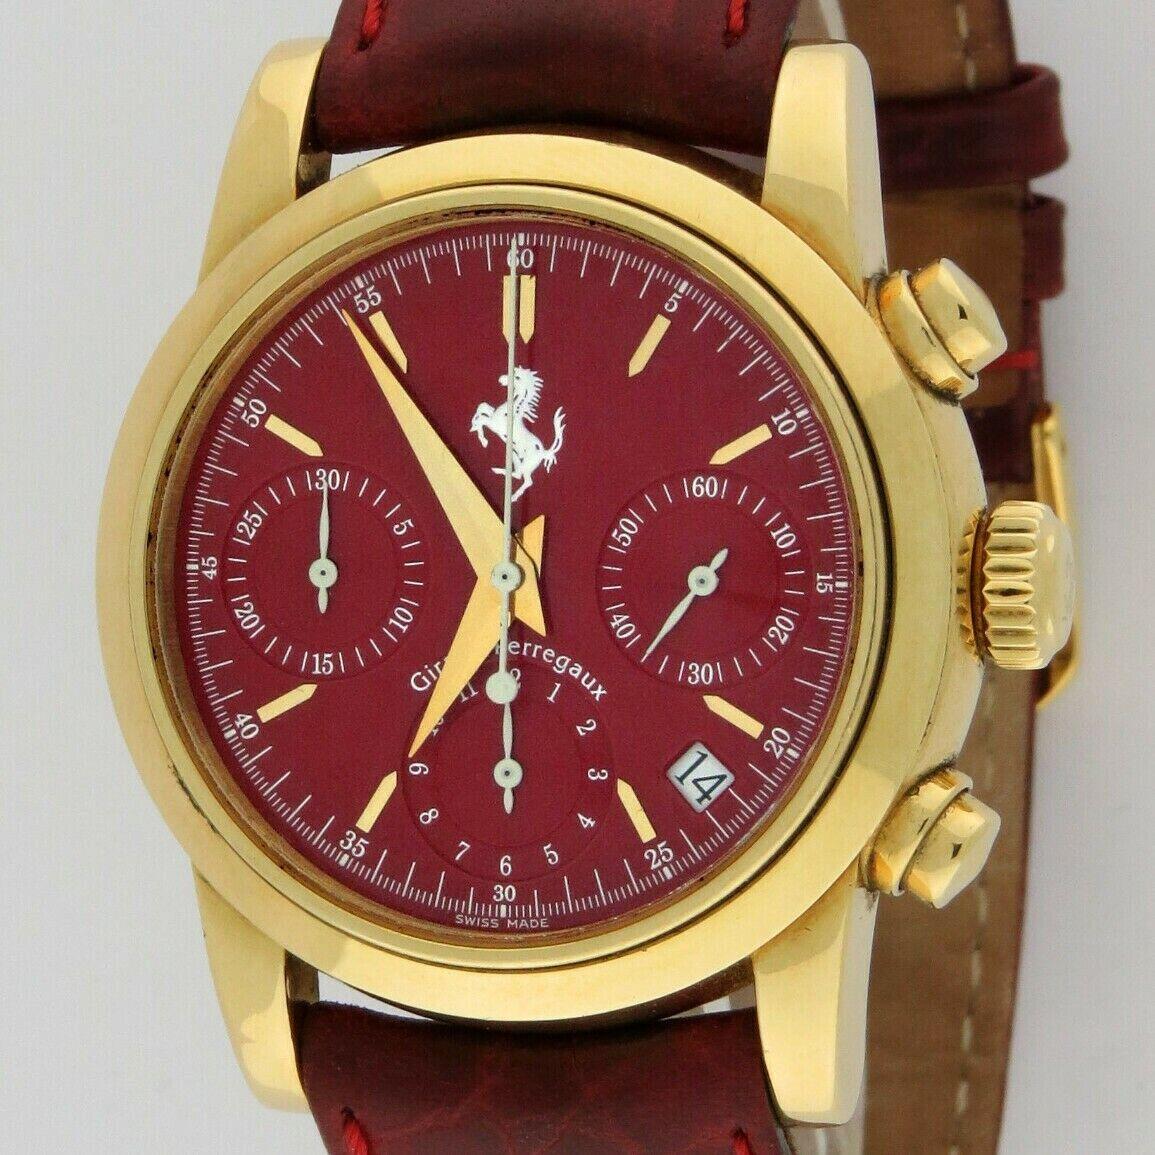 Girard-Perregaux Ferarri Chronograph 18 KG - watch picture 1